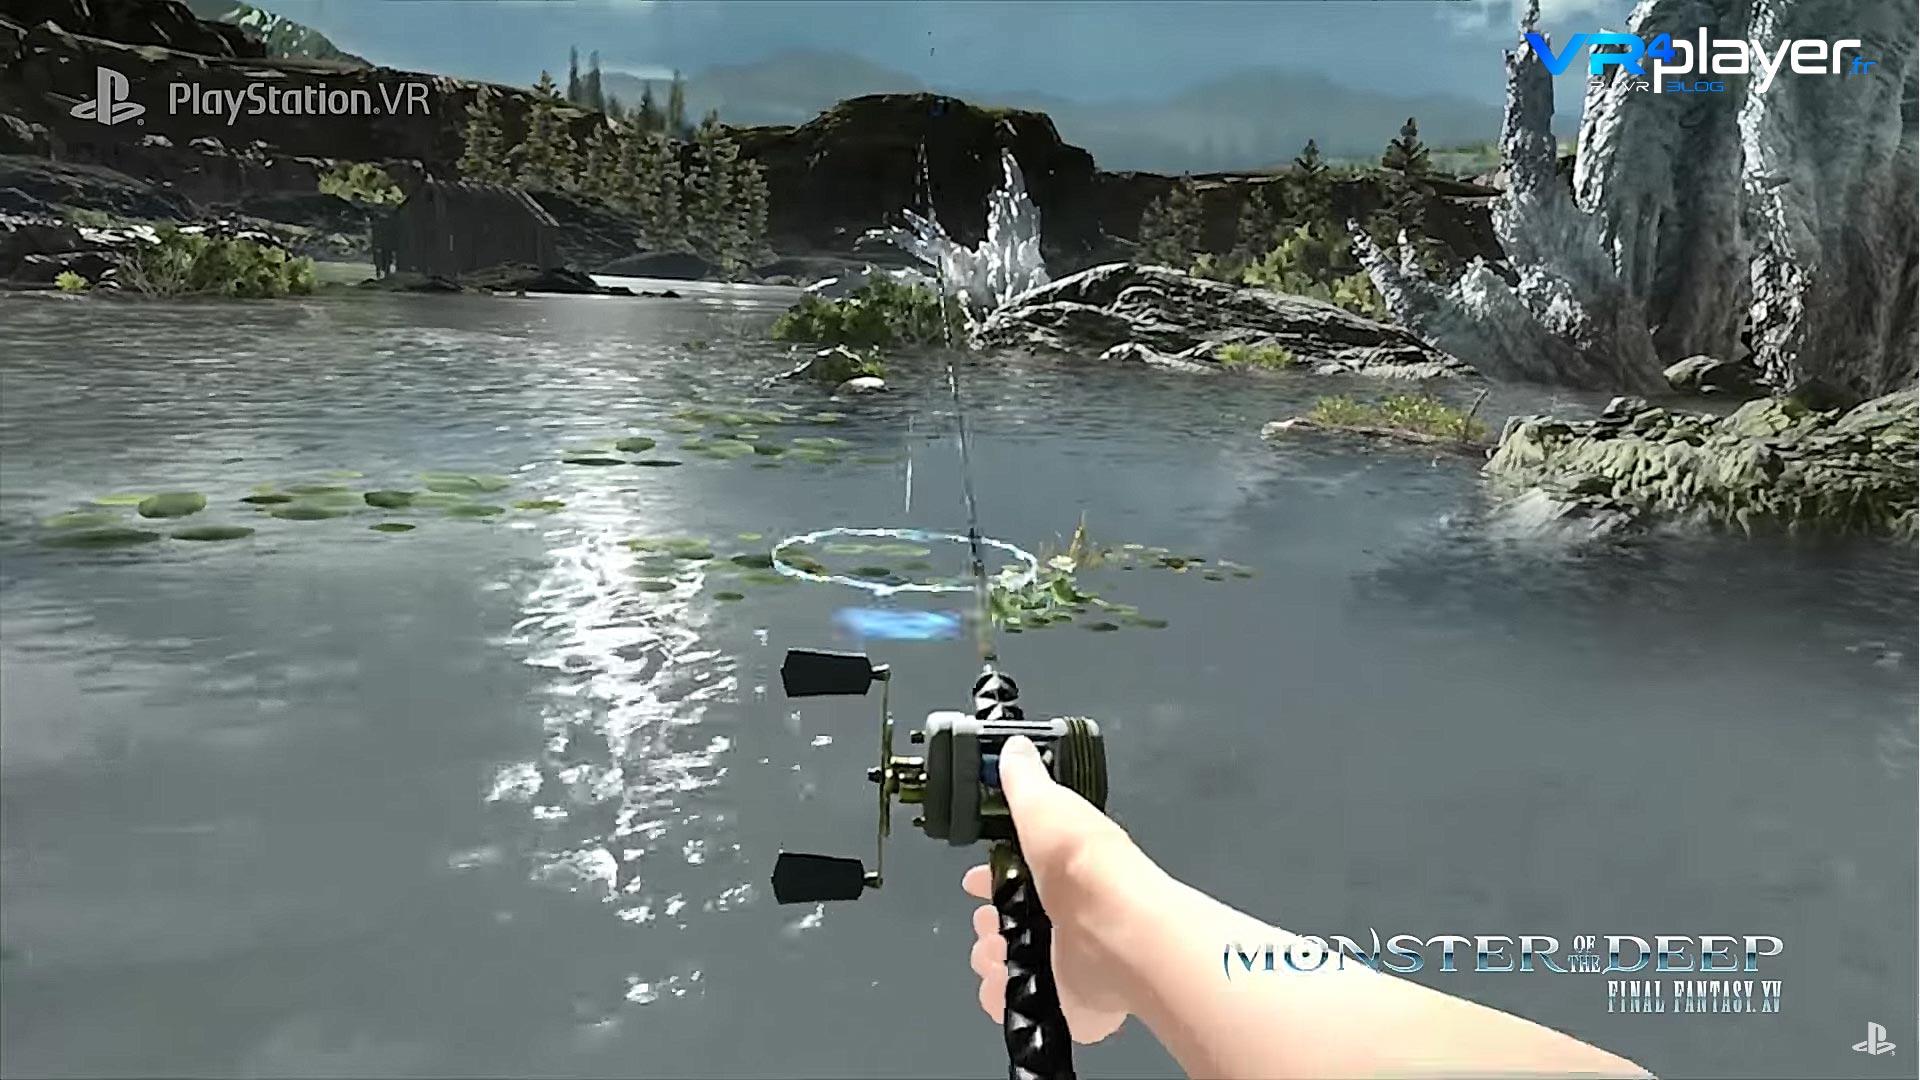 FF XV Monster of the Deep PSVR - VR4Player